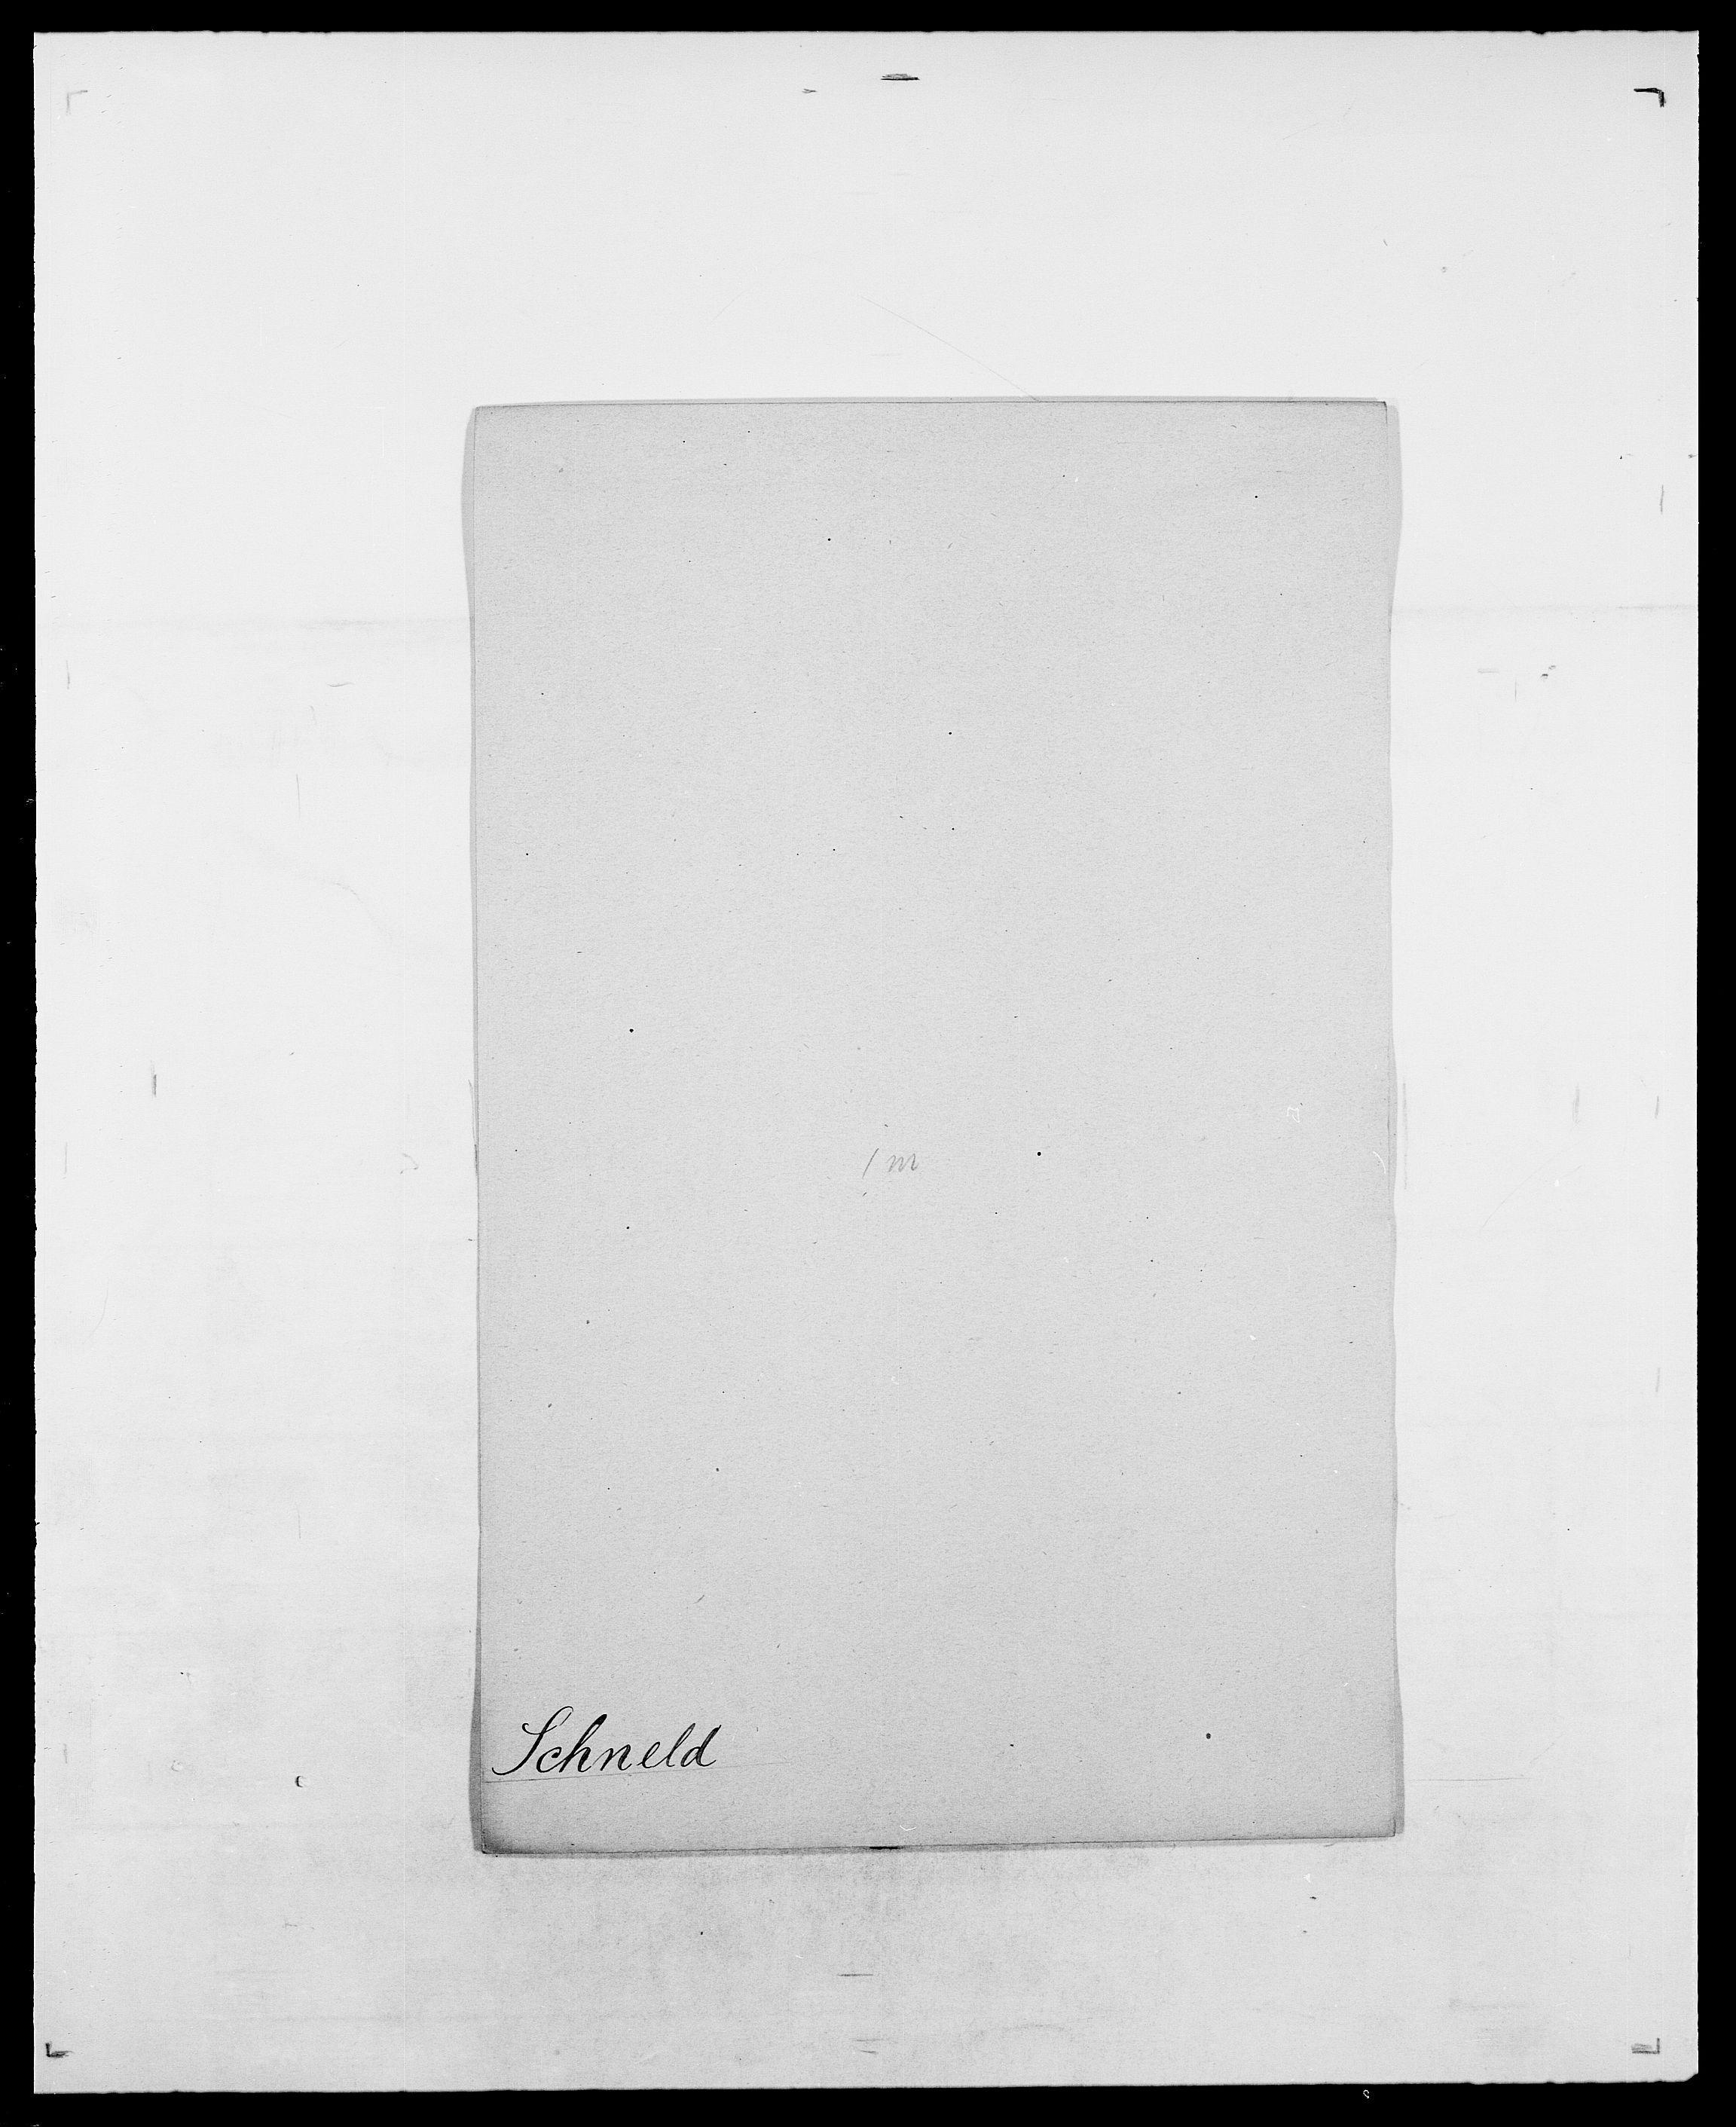 SAO, Delgobe, Charles Antoine - samling, D/Da/L0035: Schnabel - sjetman, s. 20